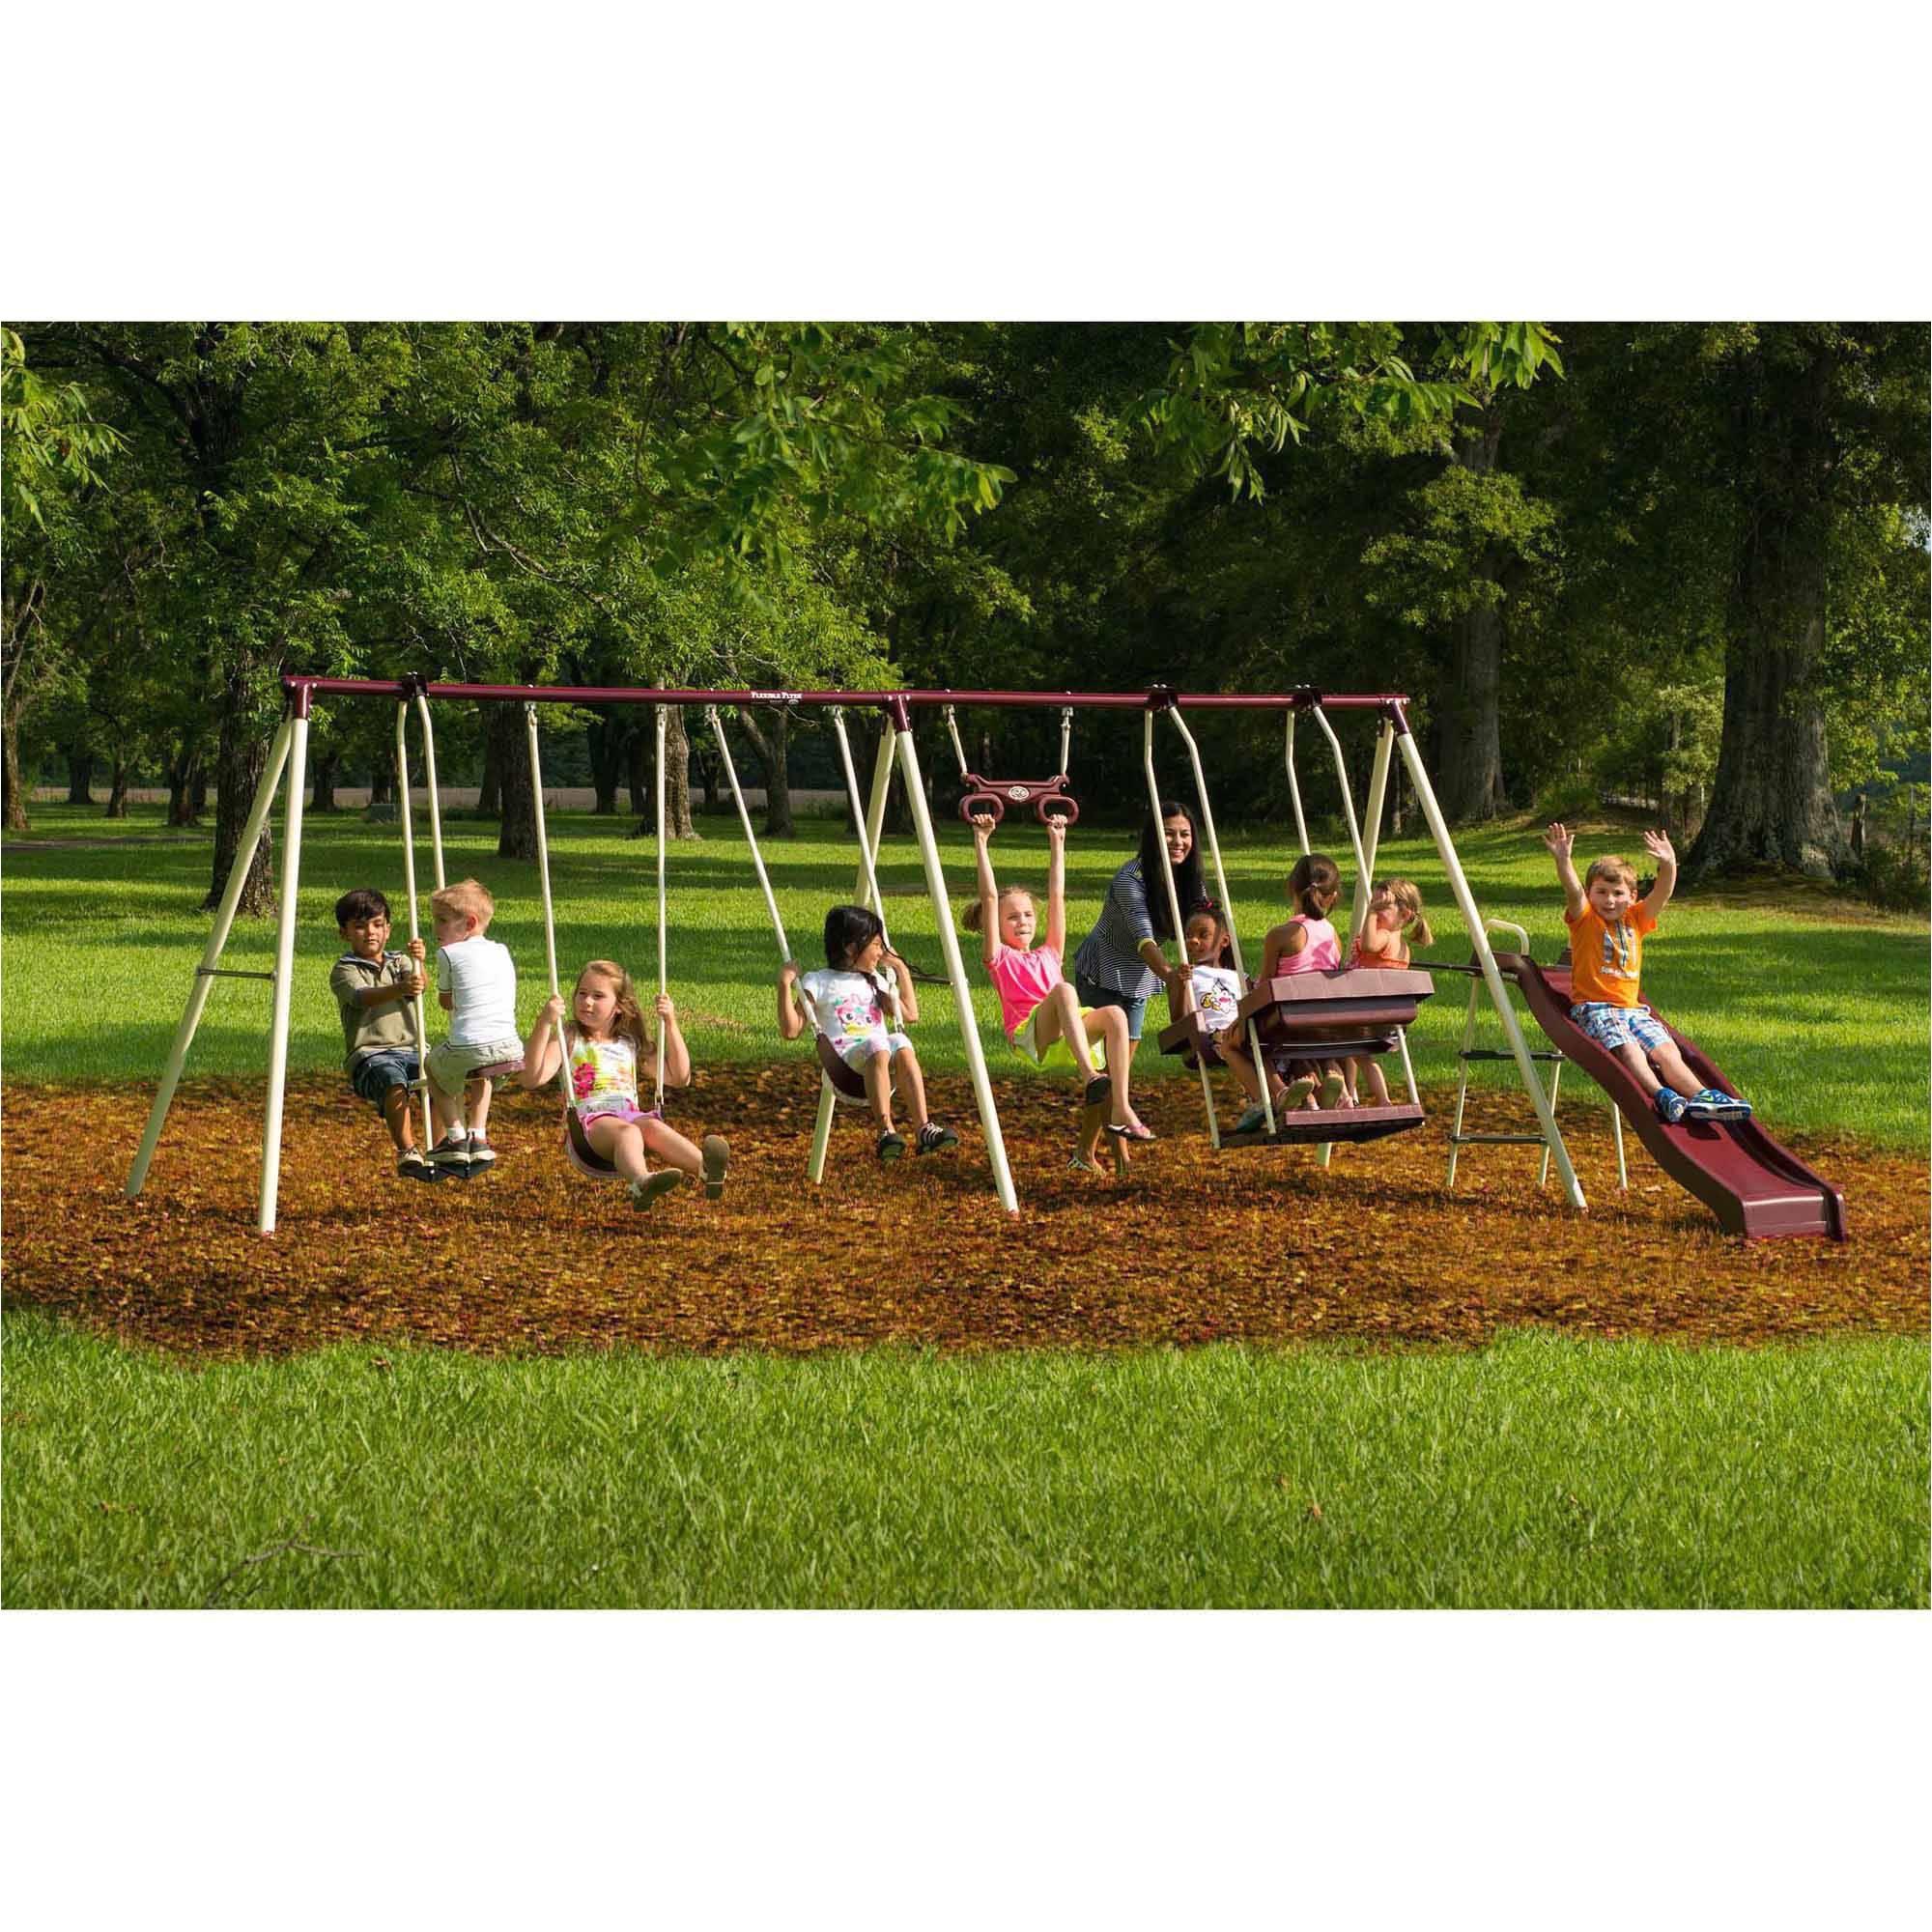 Flexible Flyer Backyard Swingin Fun Metal Swing Set Flexible Flyer Play Park Metal Swing Set Walmart Com